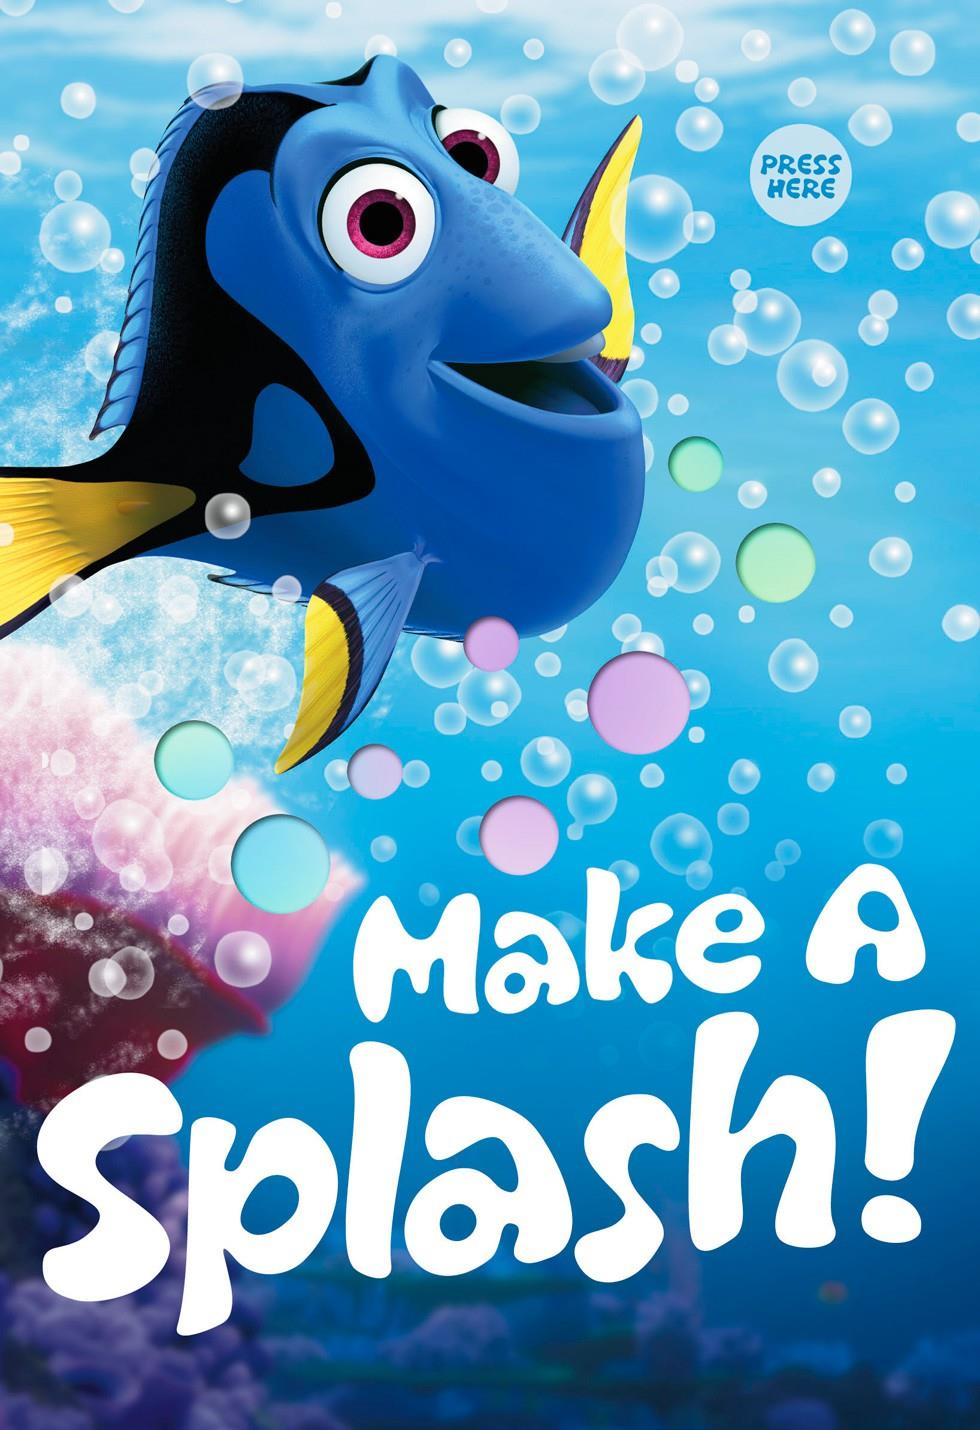 Make A Splash Kids Birthday Light And Song Card Greeting